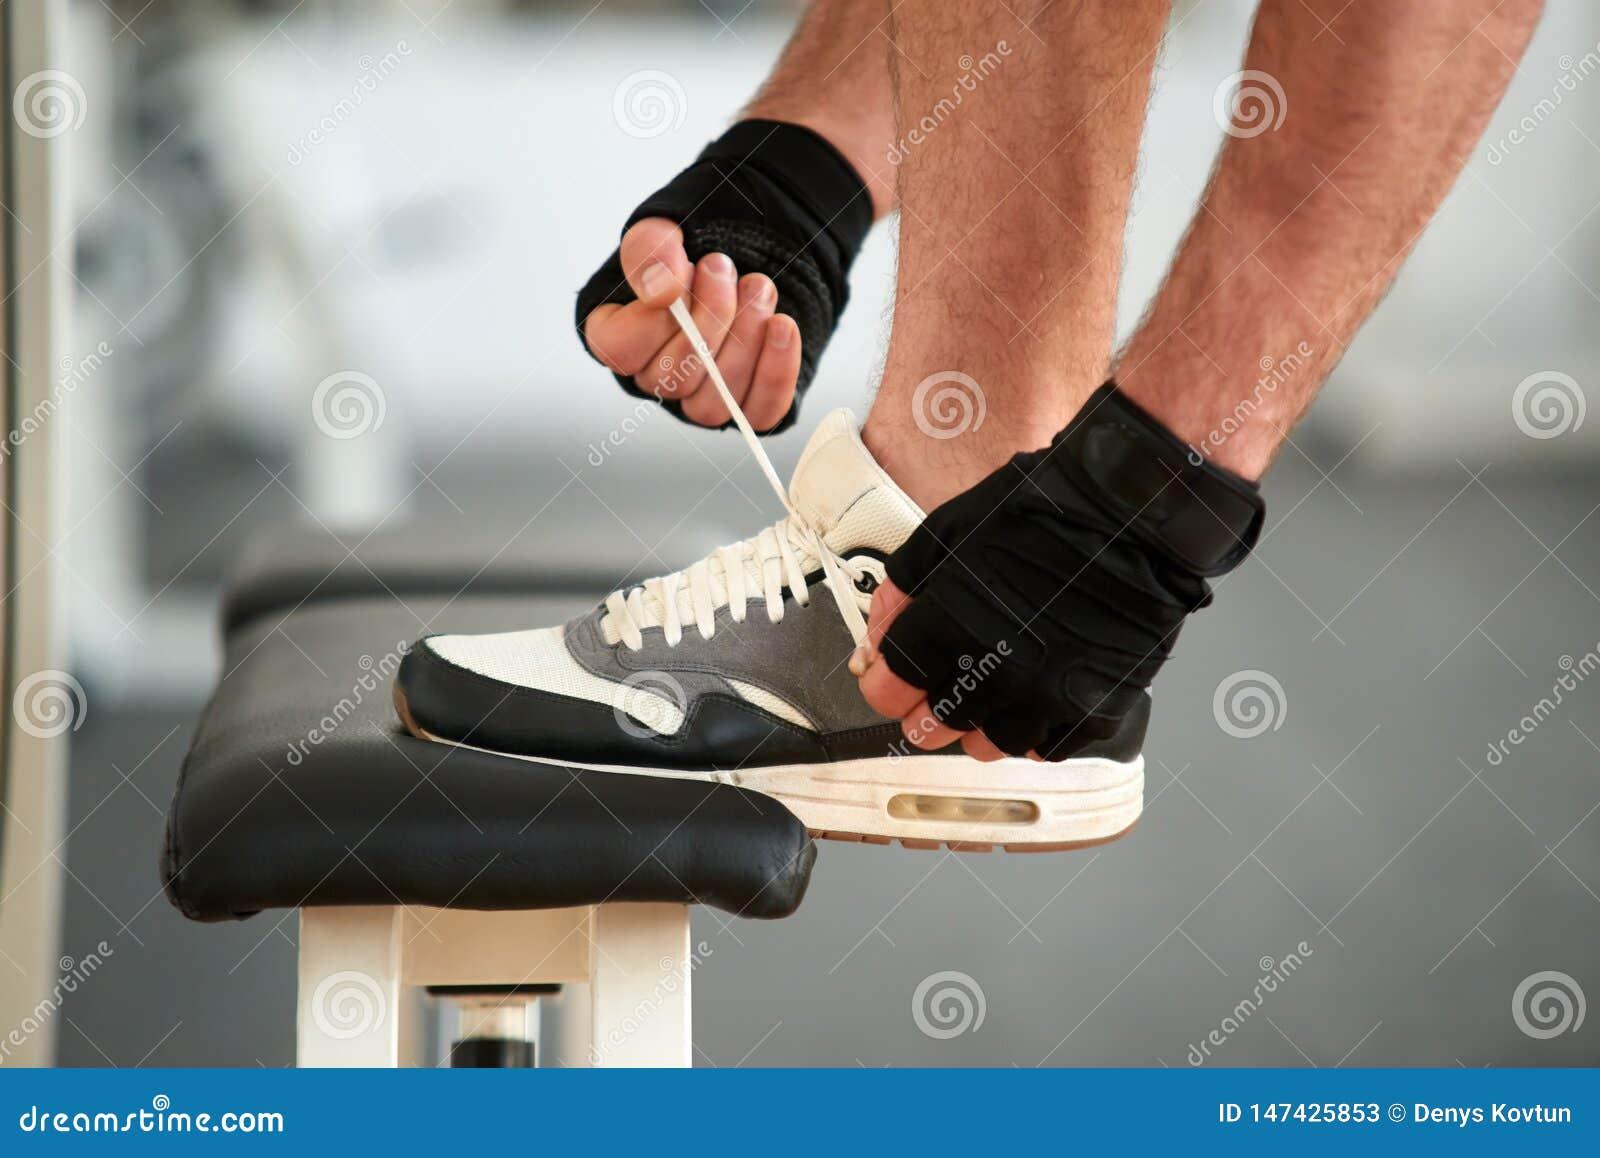 Man Tying Running Shoes In Gym. Stock